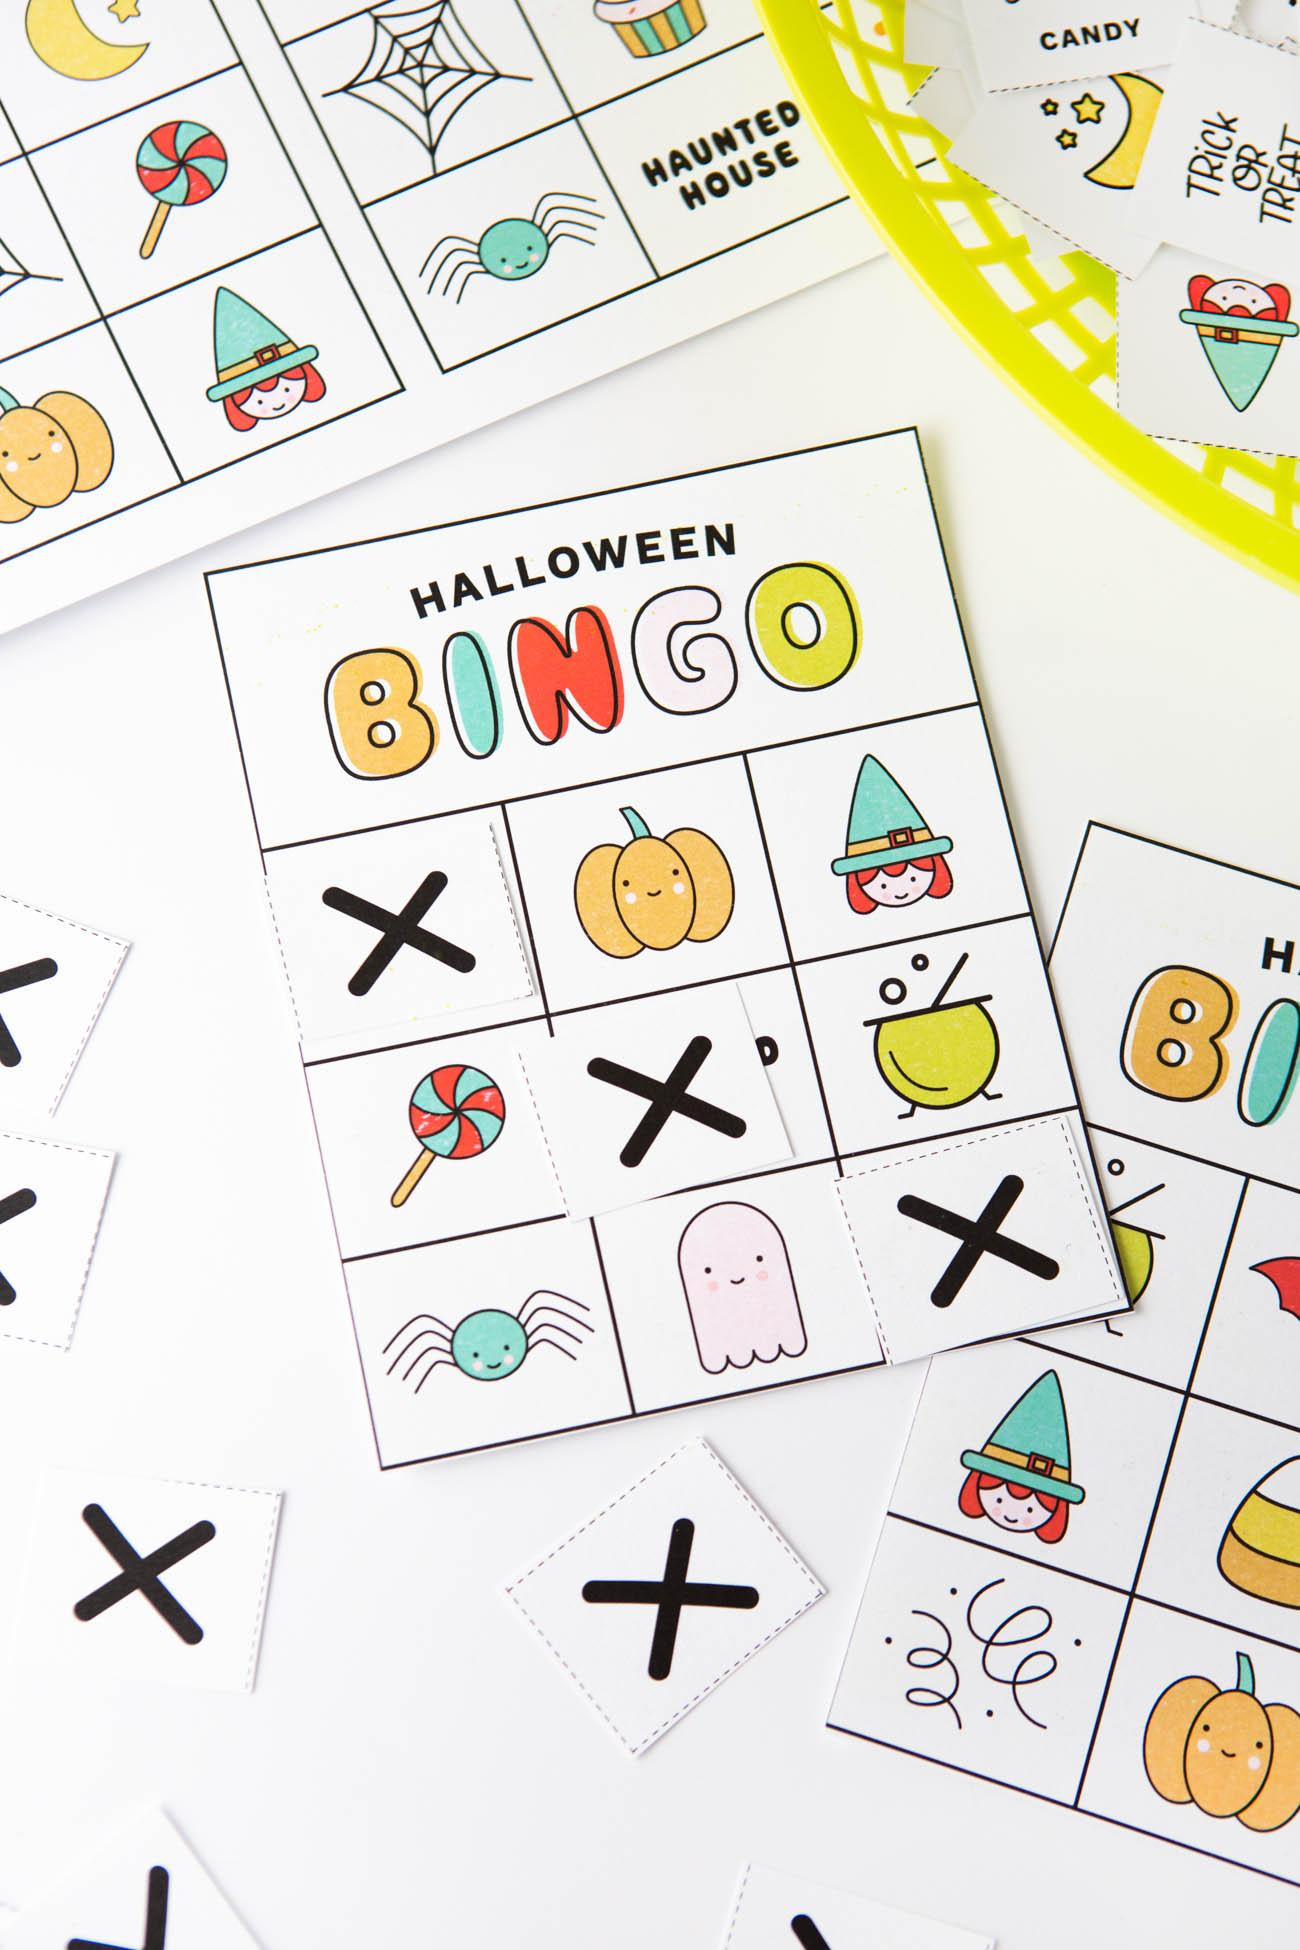 Free Printable Halloween Bingo Cards - Design Eat Repeat